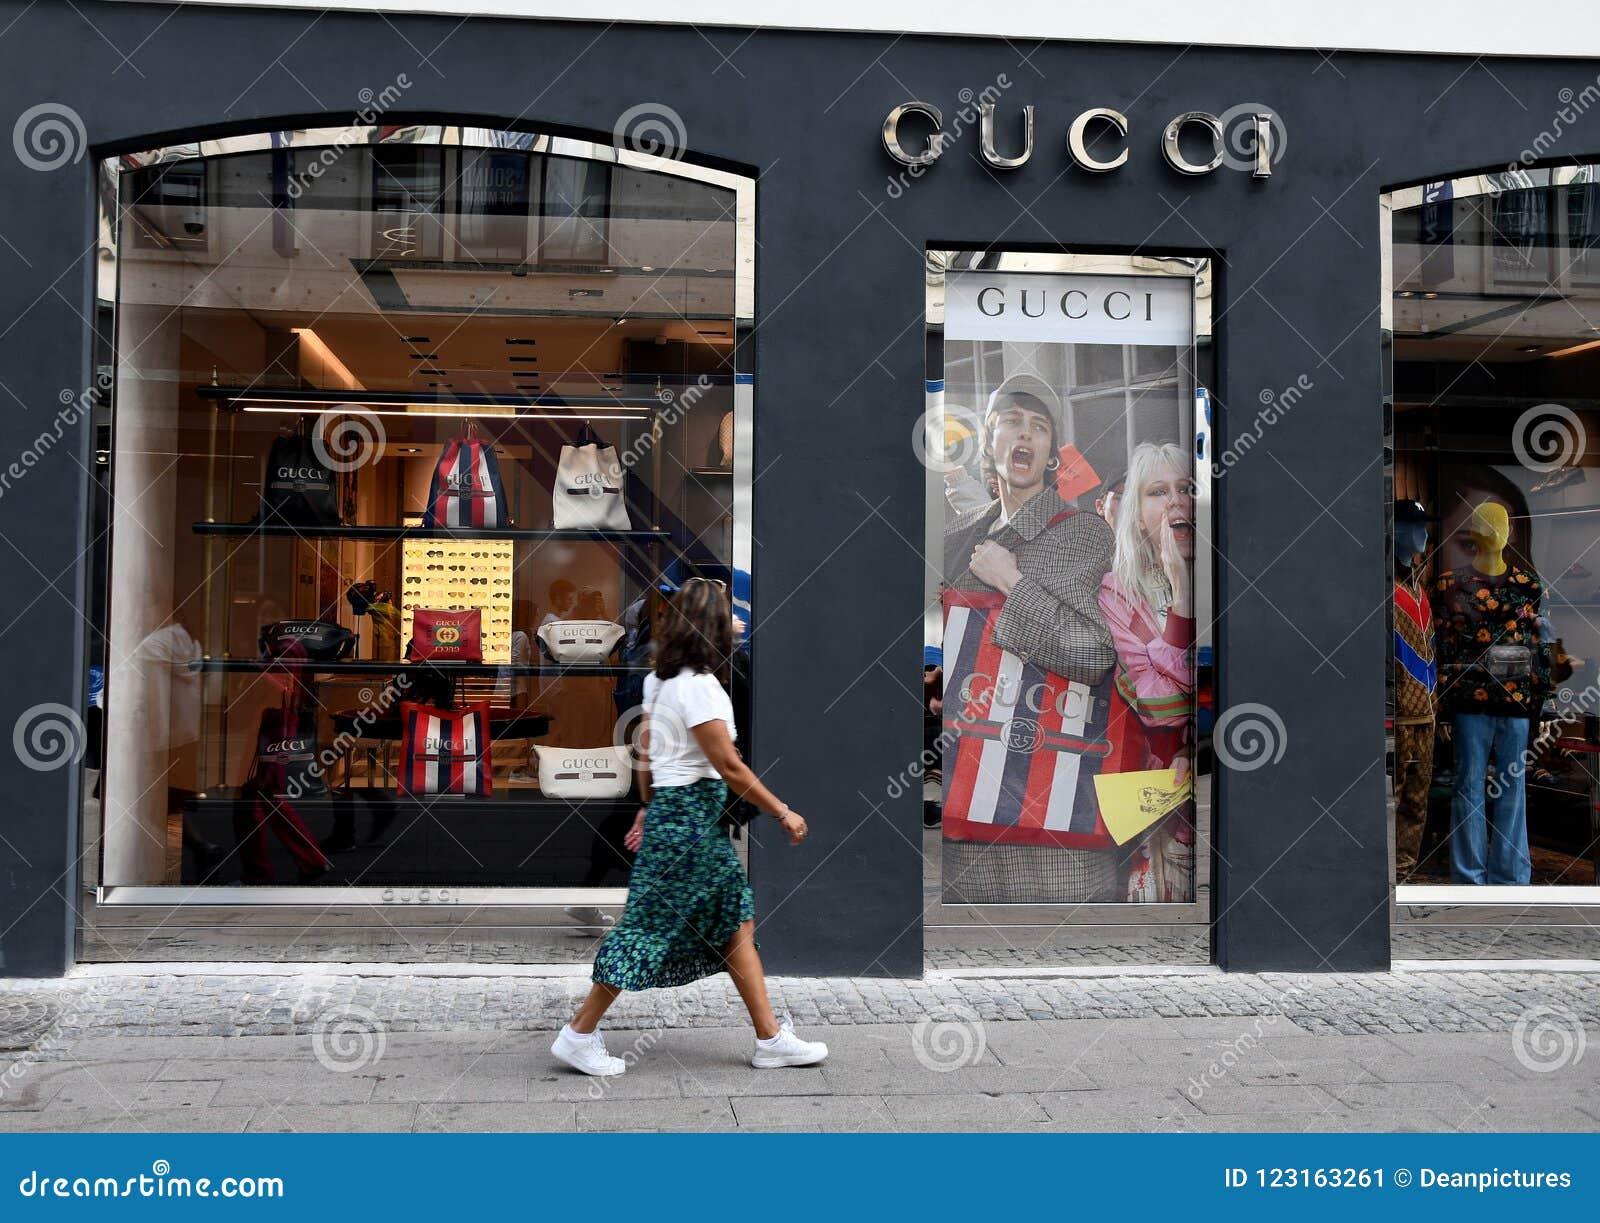 0394ad3ae7e Copenhagen Denmark 06.August 2018  .Gucci store on stroeget in dansh  capital. Photo.Francis Joseph Dean   Deanpictures.